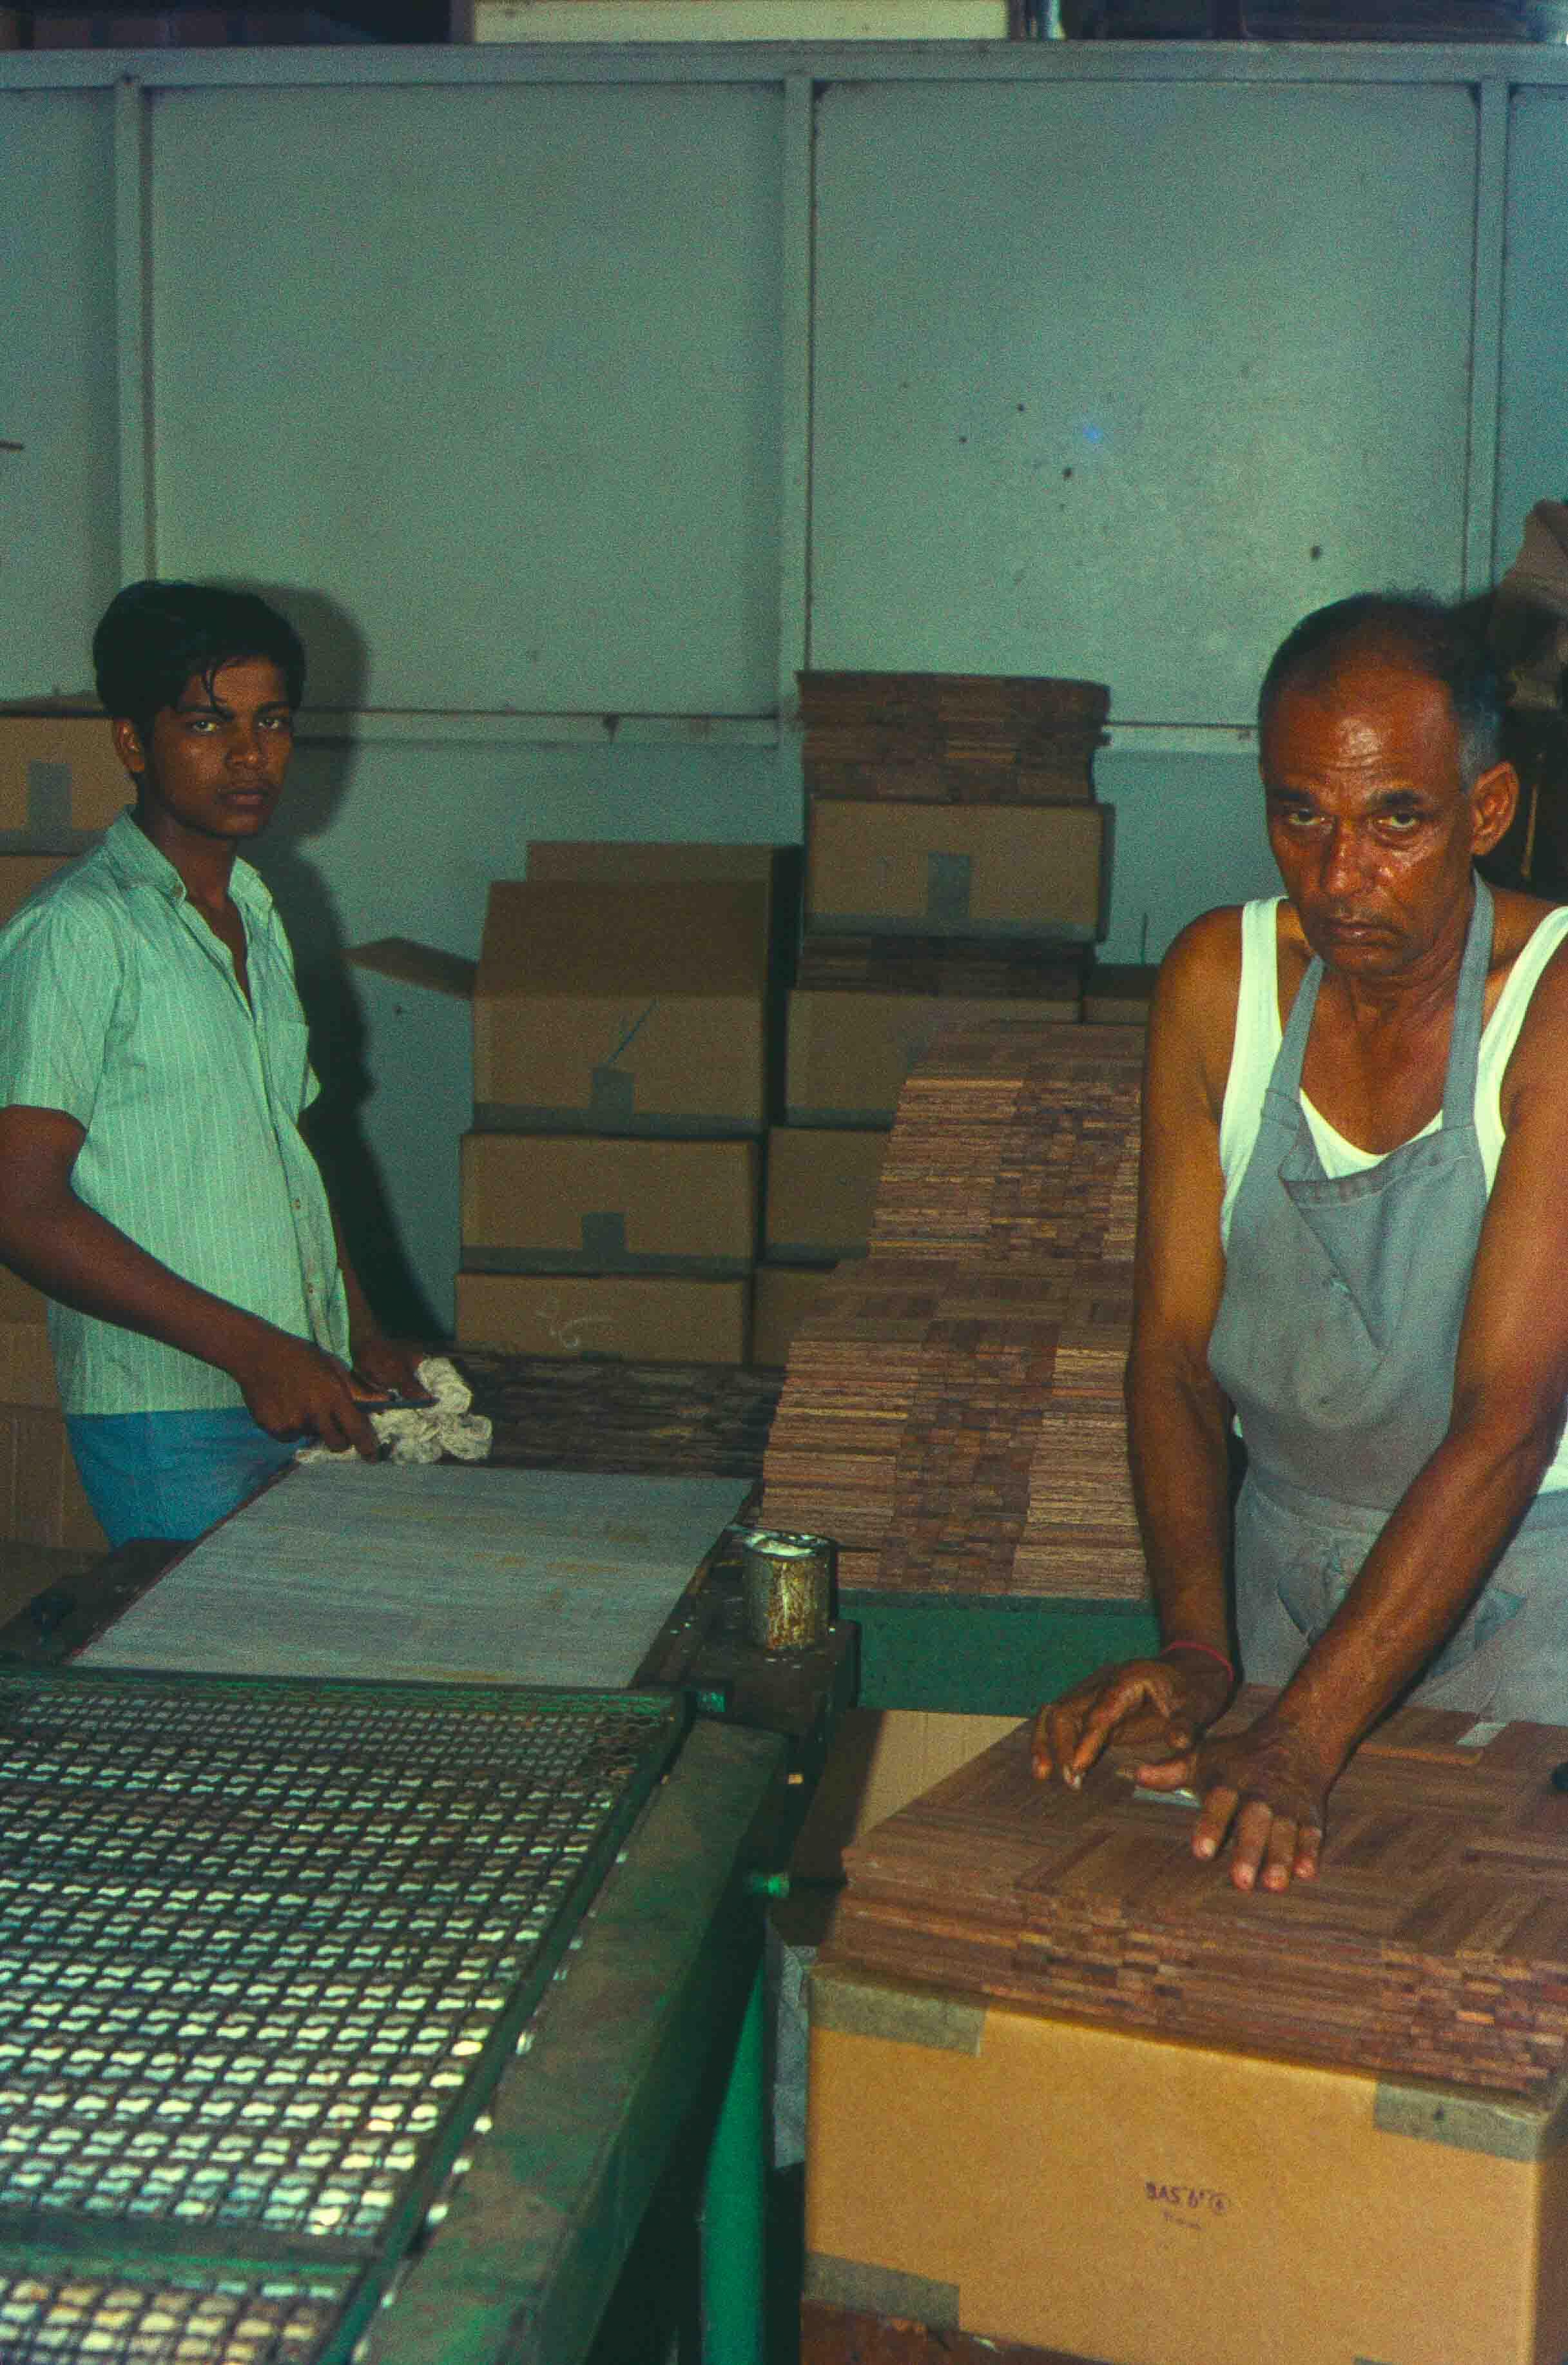 577. Suriname